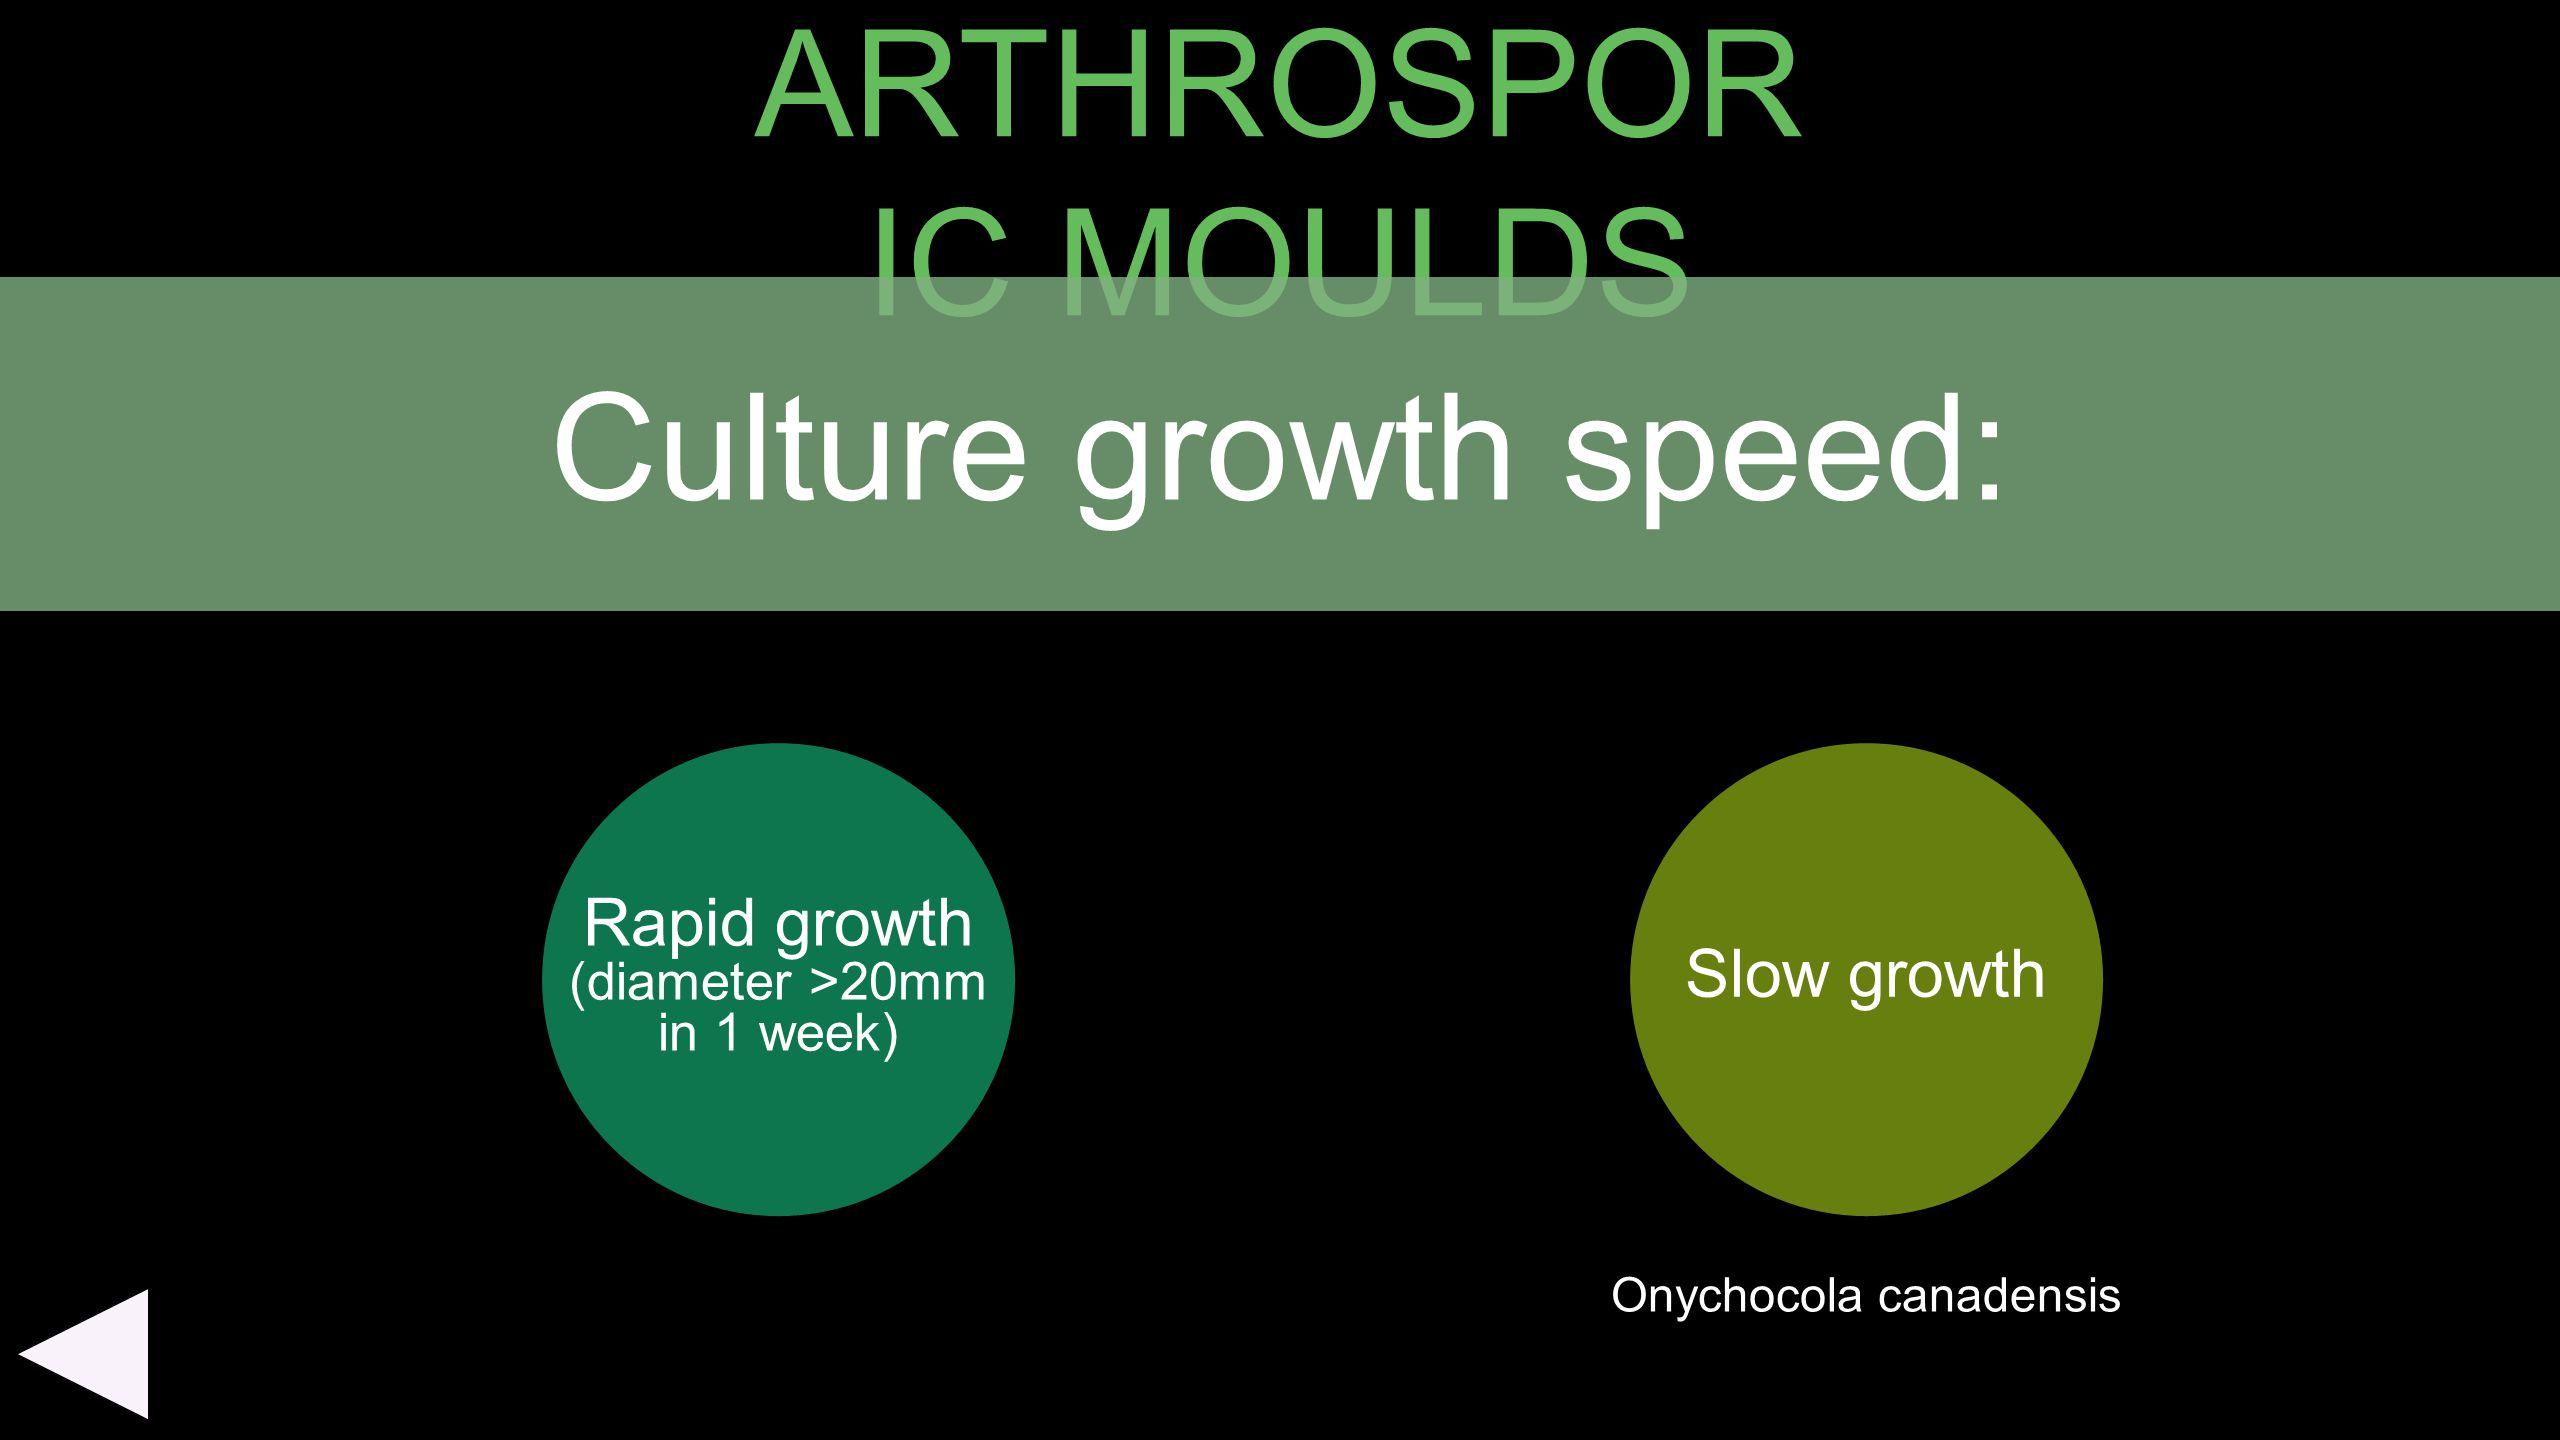 ARTHROSPOR IC MOULDS Rapid growth (diameter >20mm in 1 week) Slow growth Culture growth speed: Onychocola canadensis